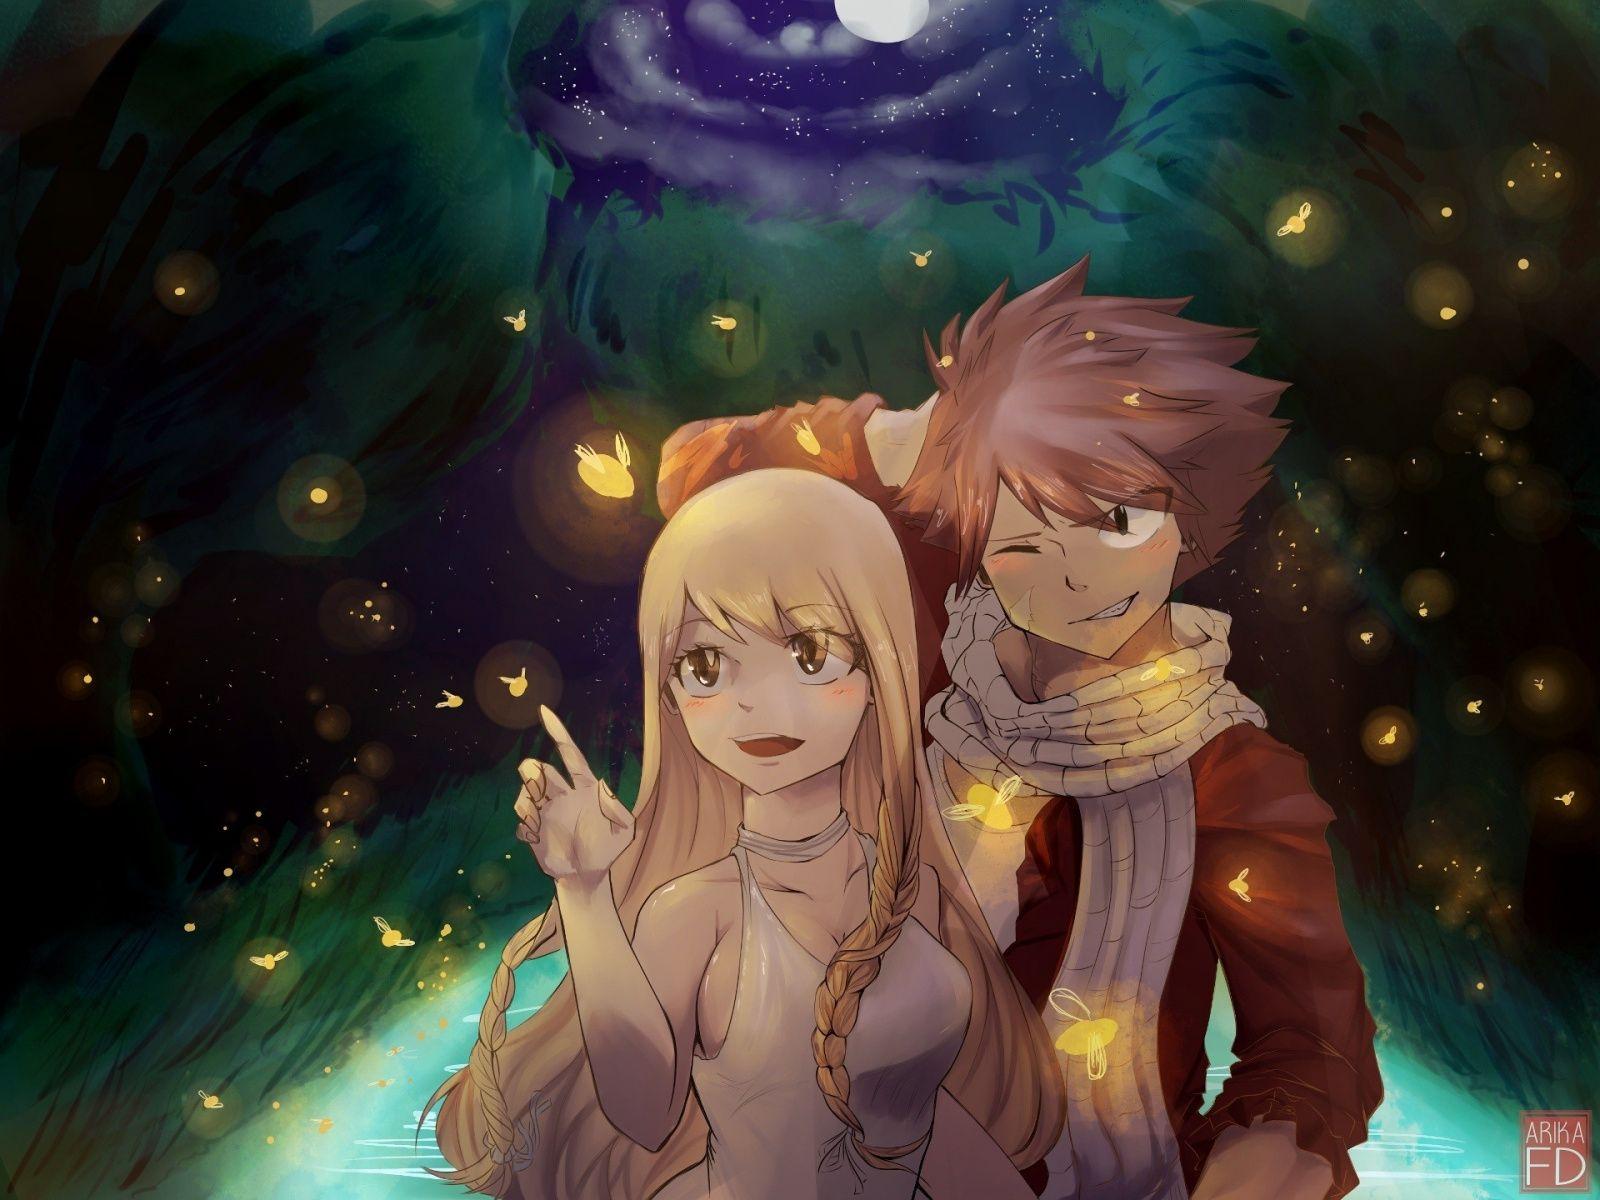 Downaload Natsu Dragneel Lucy Heartfilia Anime Couple